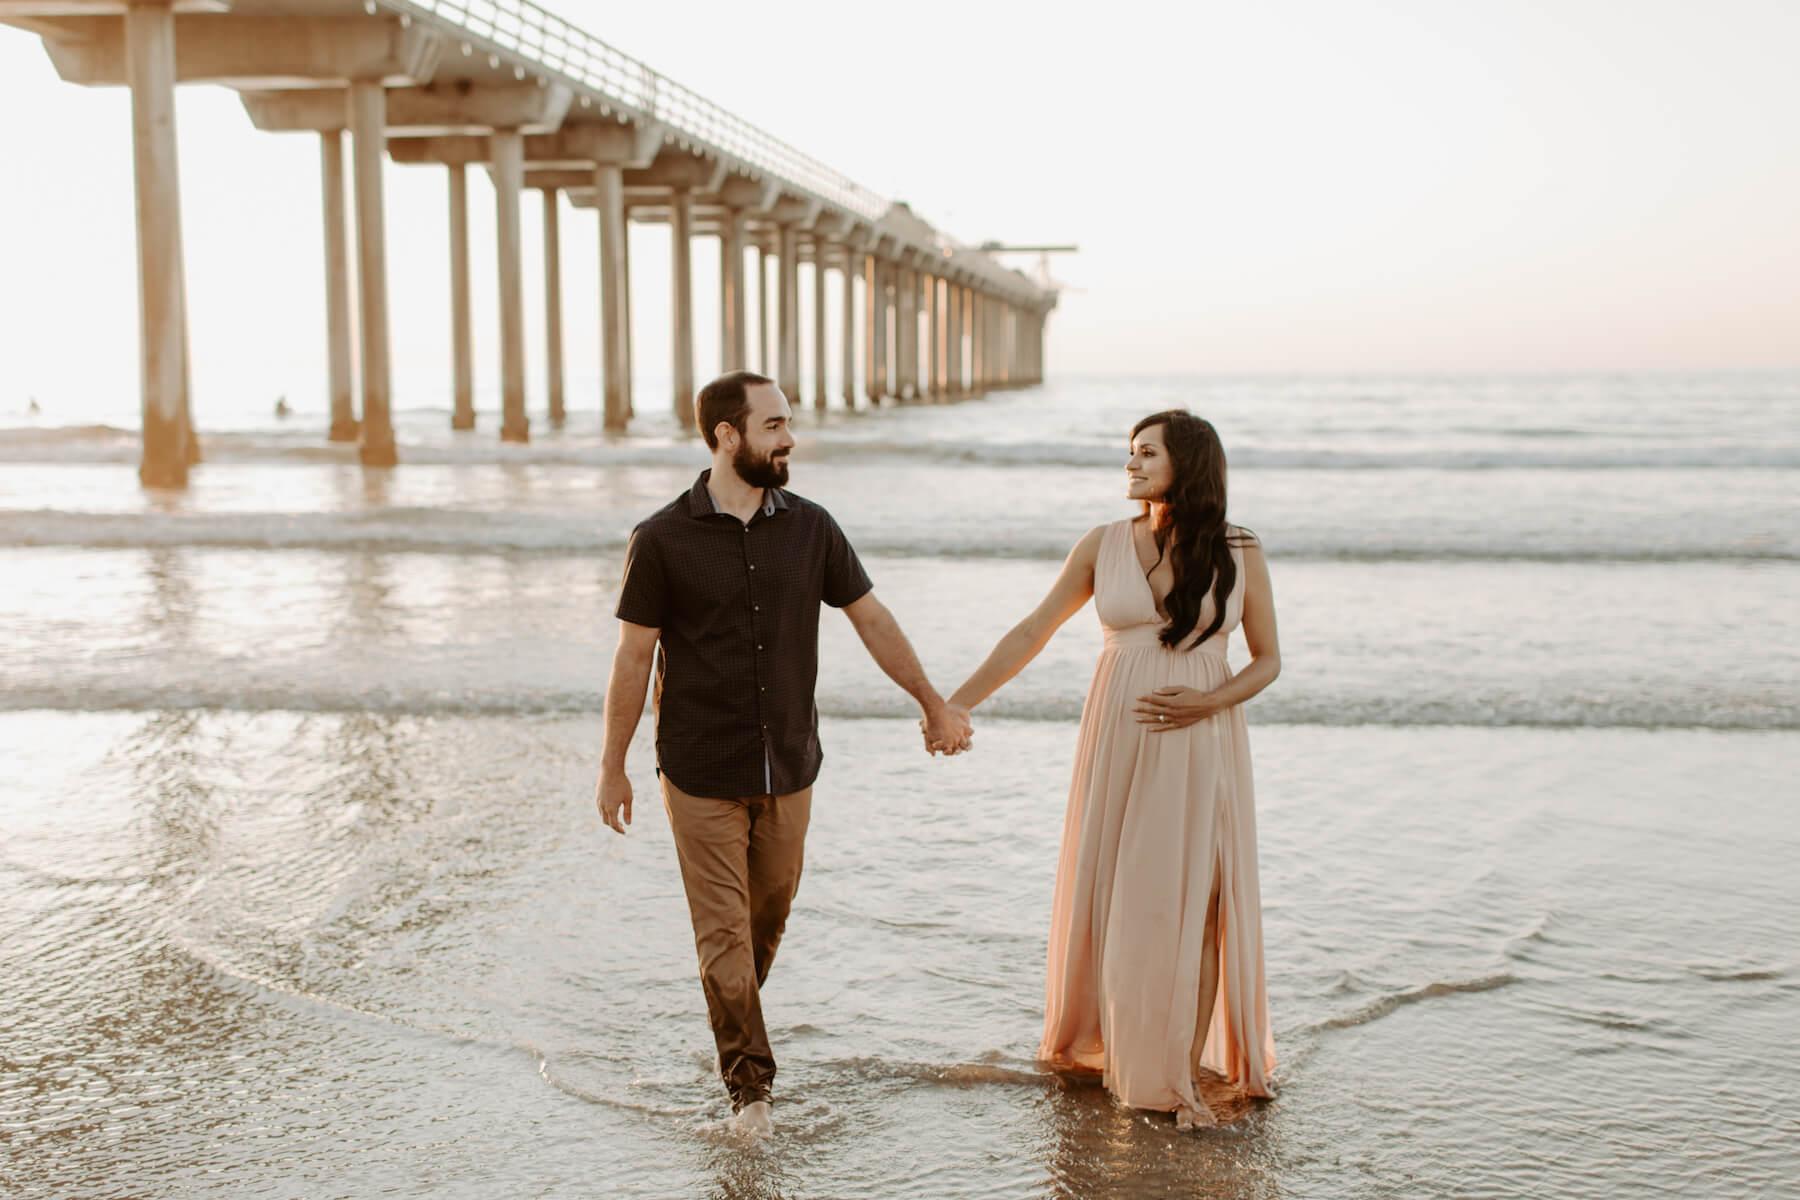 pregnant couple standing on the beach near the ocean in San Diego, California